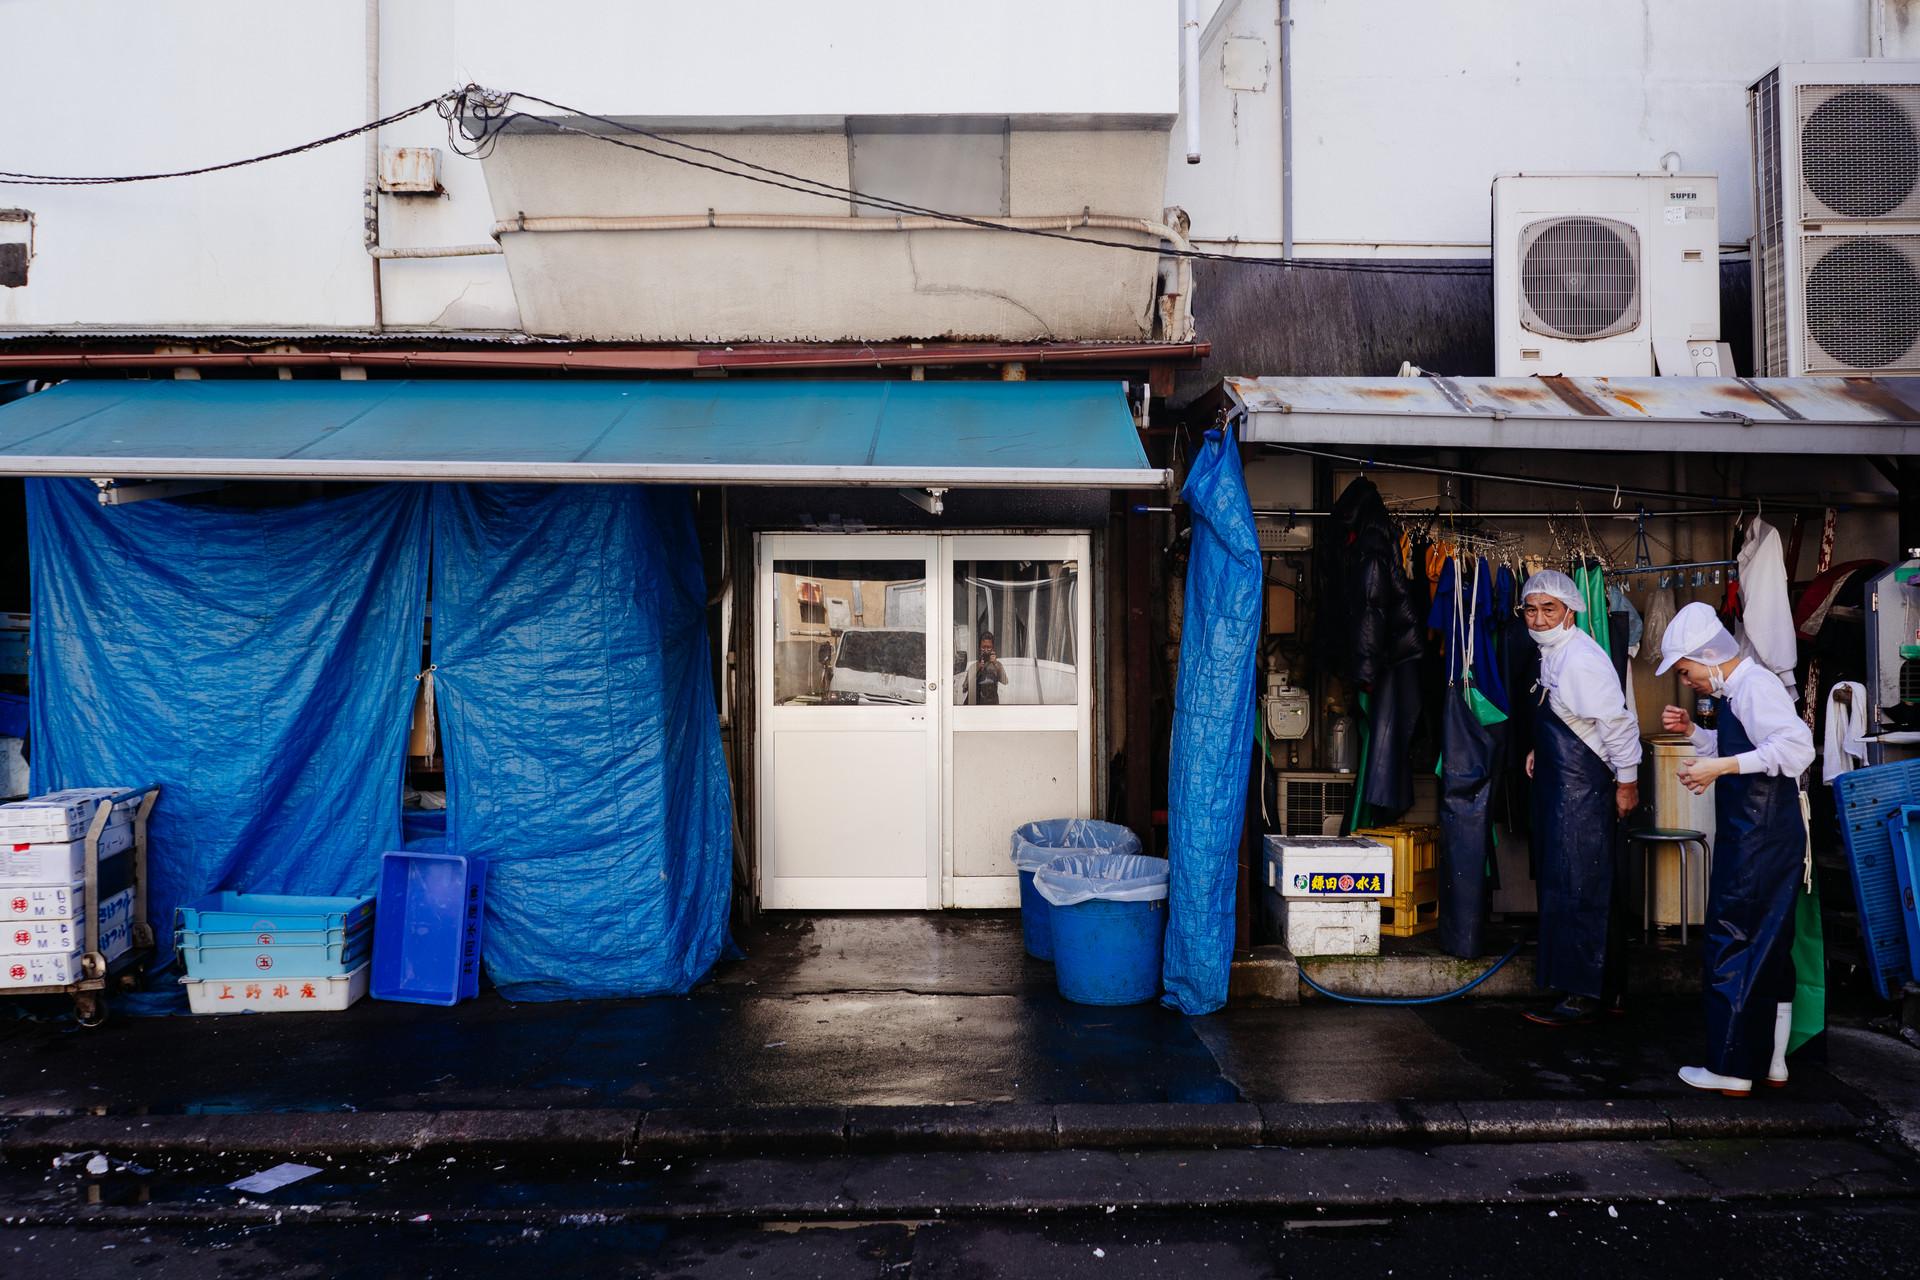 tokyo-2017_38690855552_o.jpg